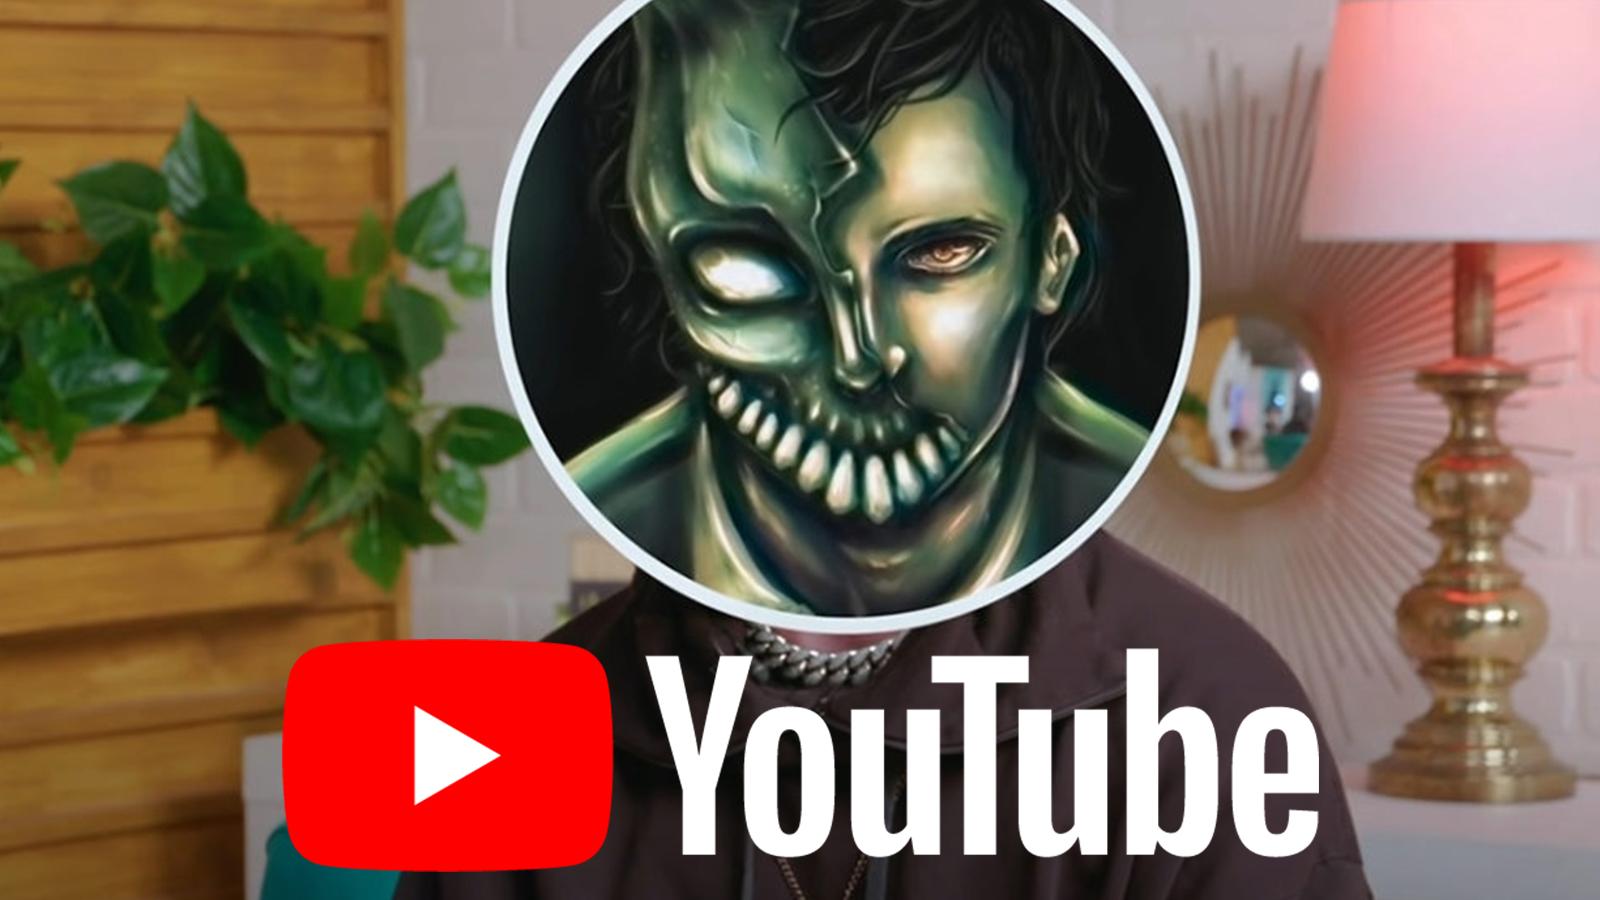 Corpse Husband clarifies statement on quitting YouTube